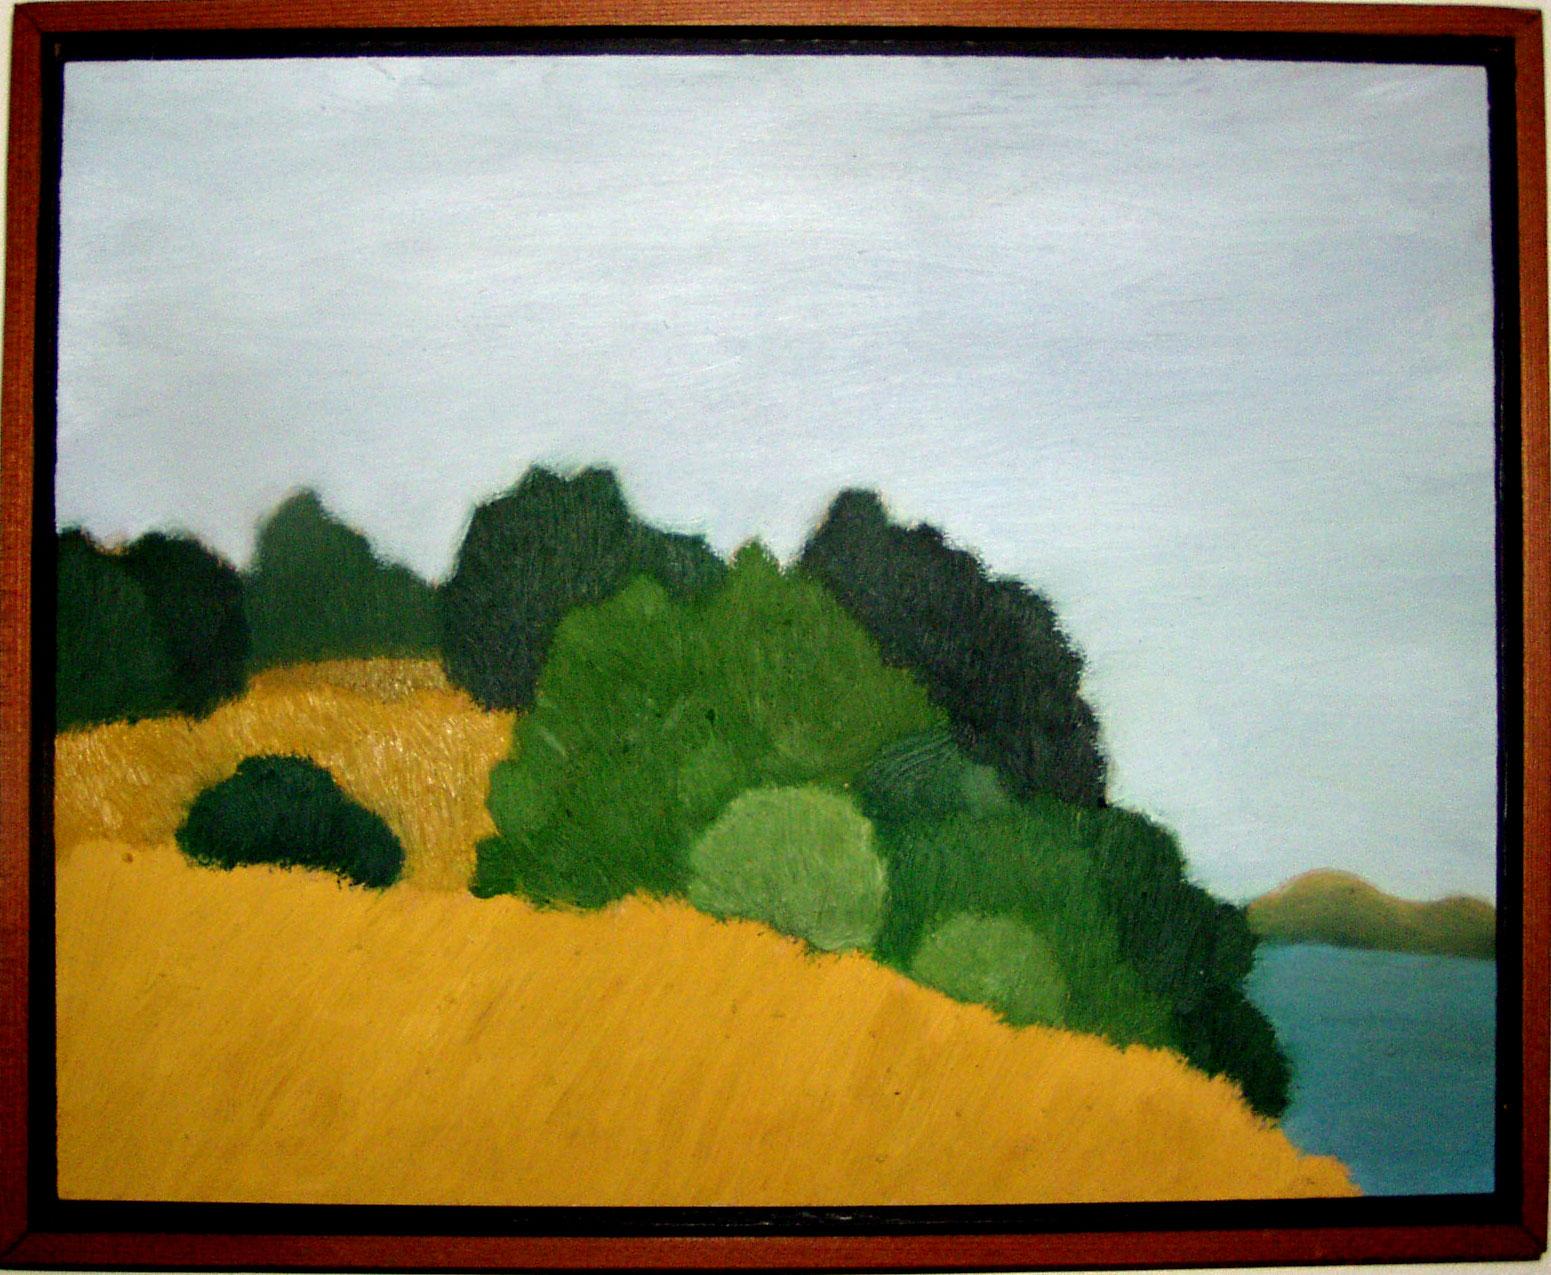 "Near Alexander Ave  Oil on panel 11"" x 14"" 2008"